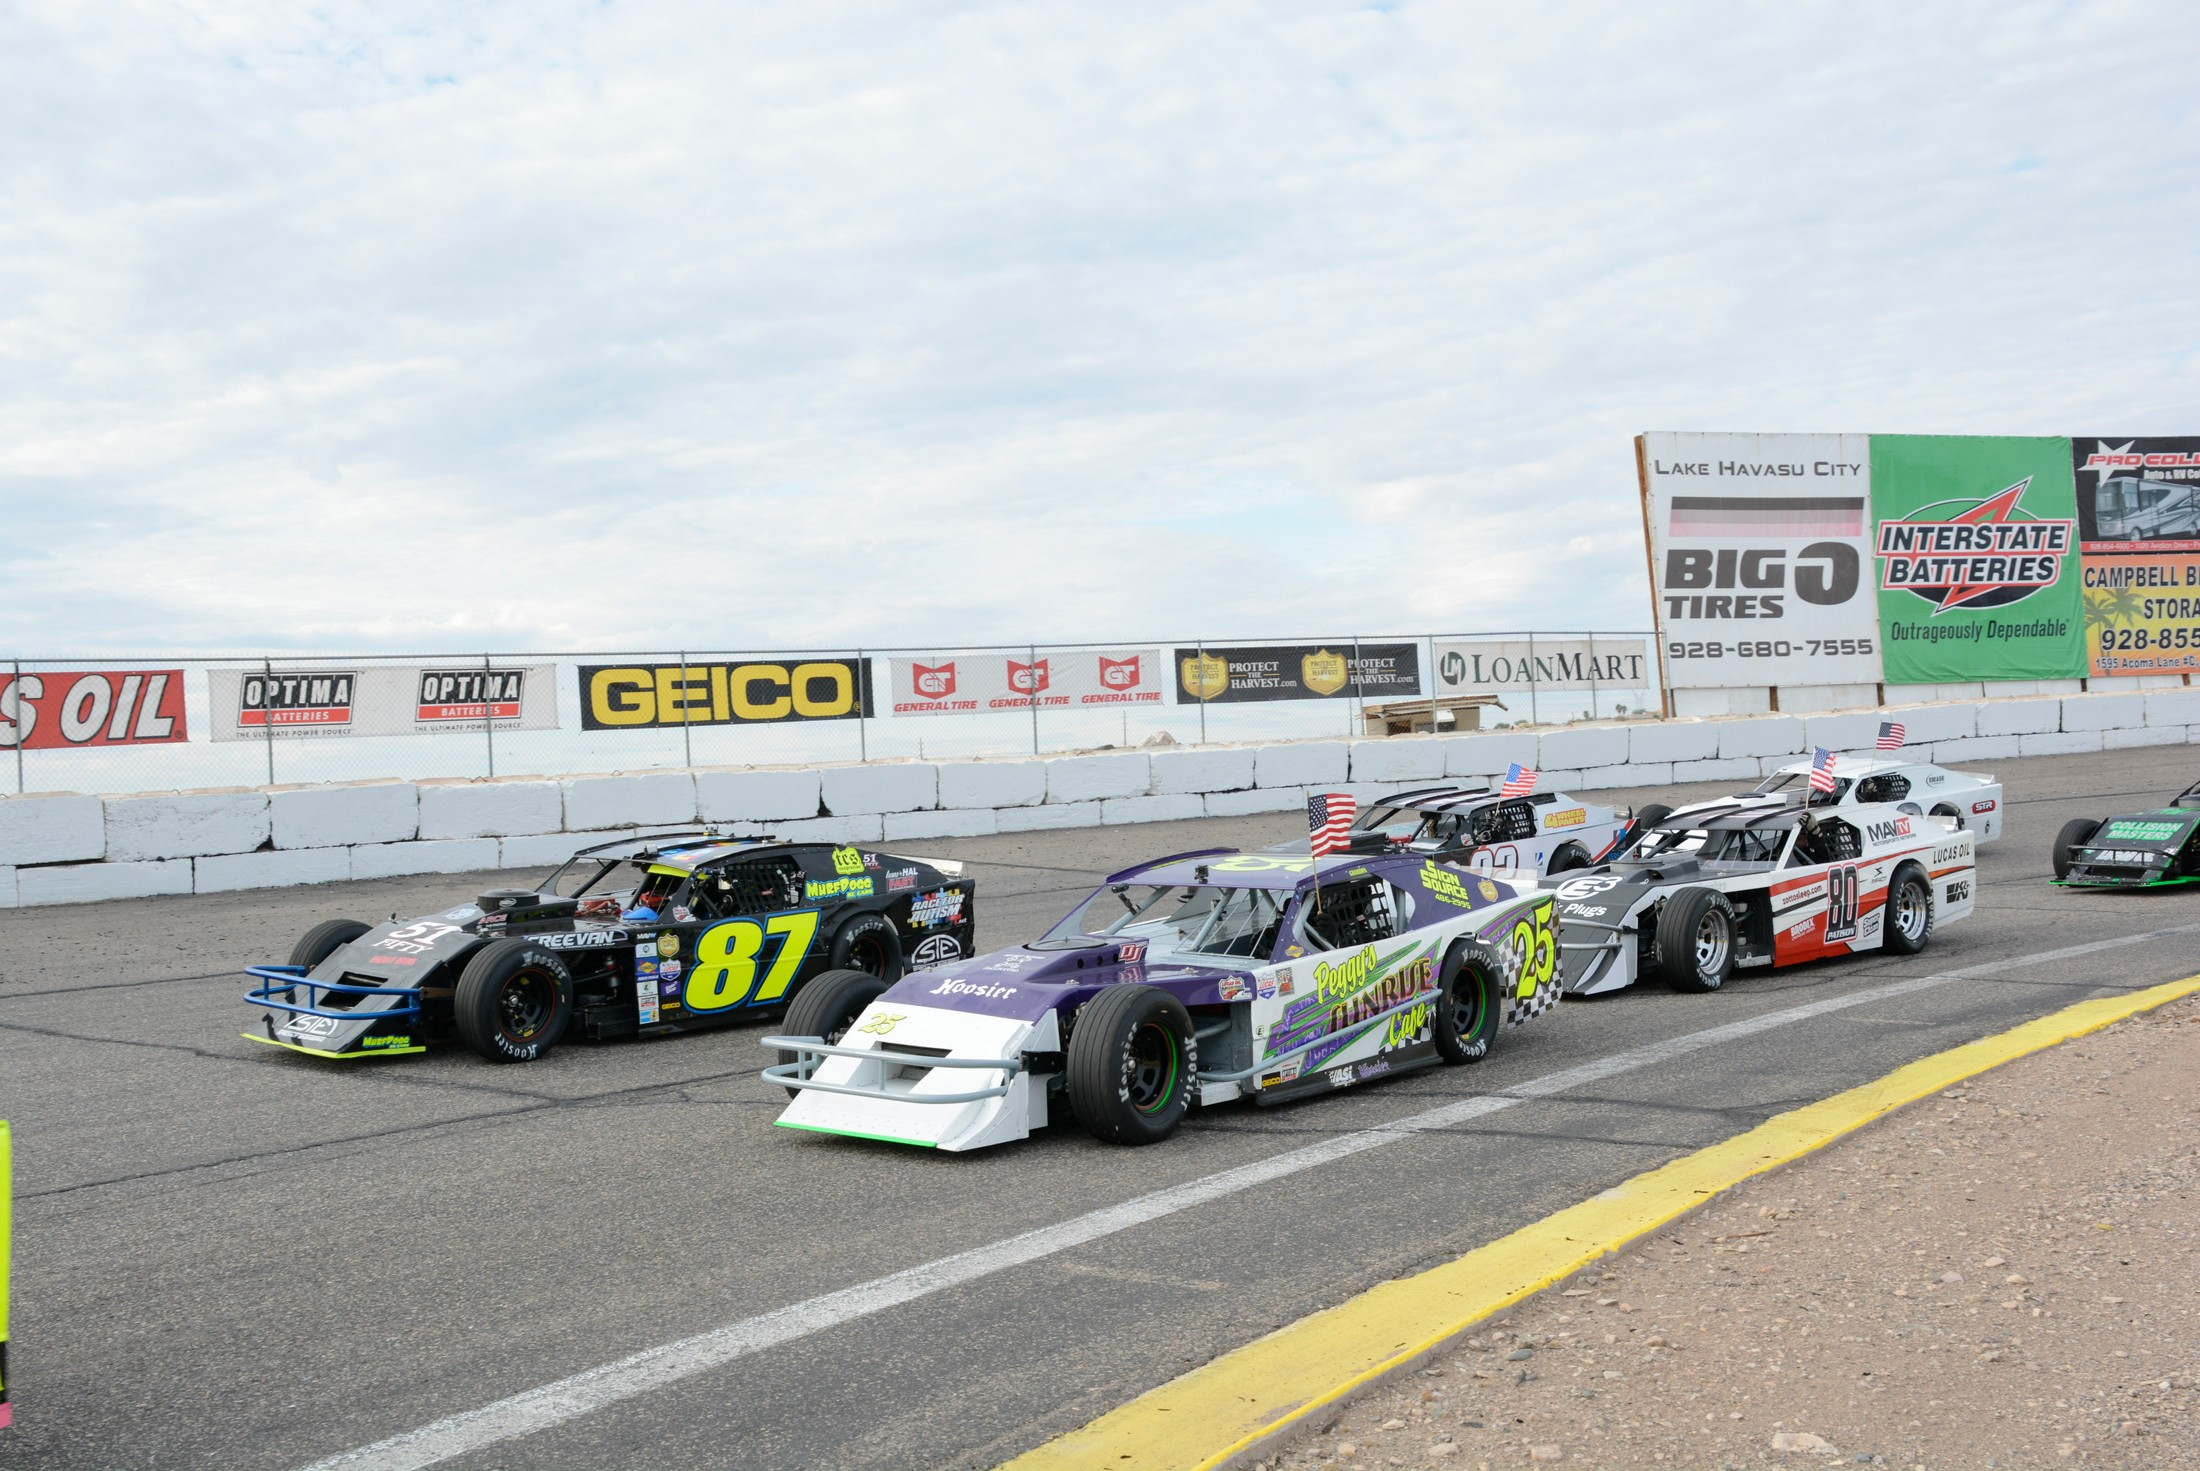 Lucas Oil Modifieds at Havasu 95 Speedway